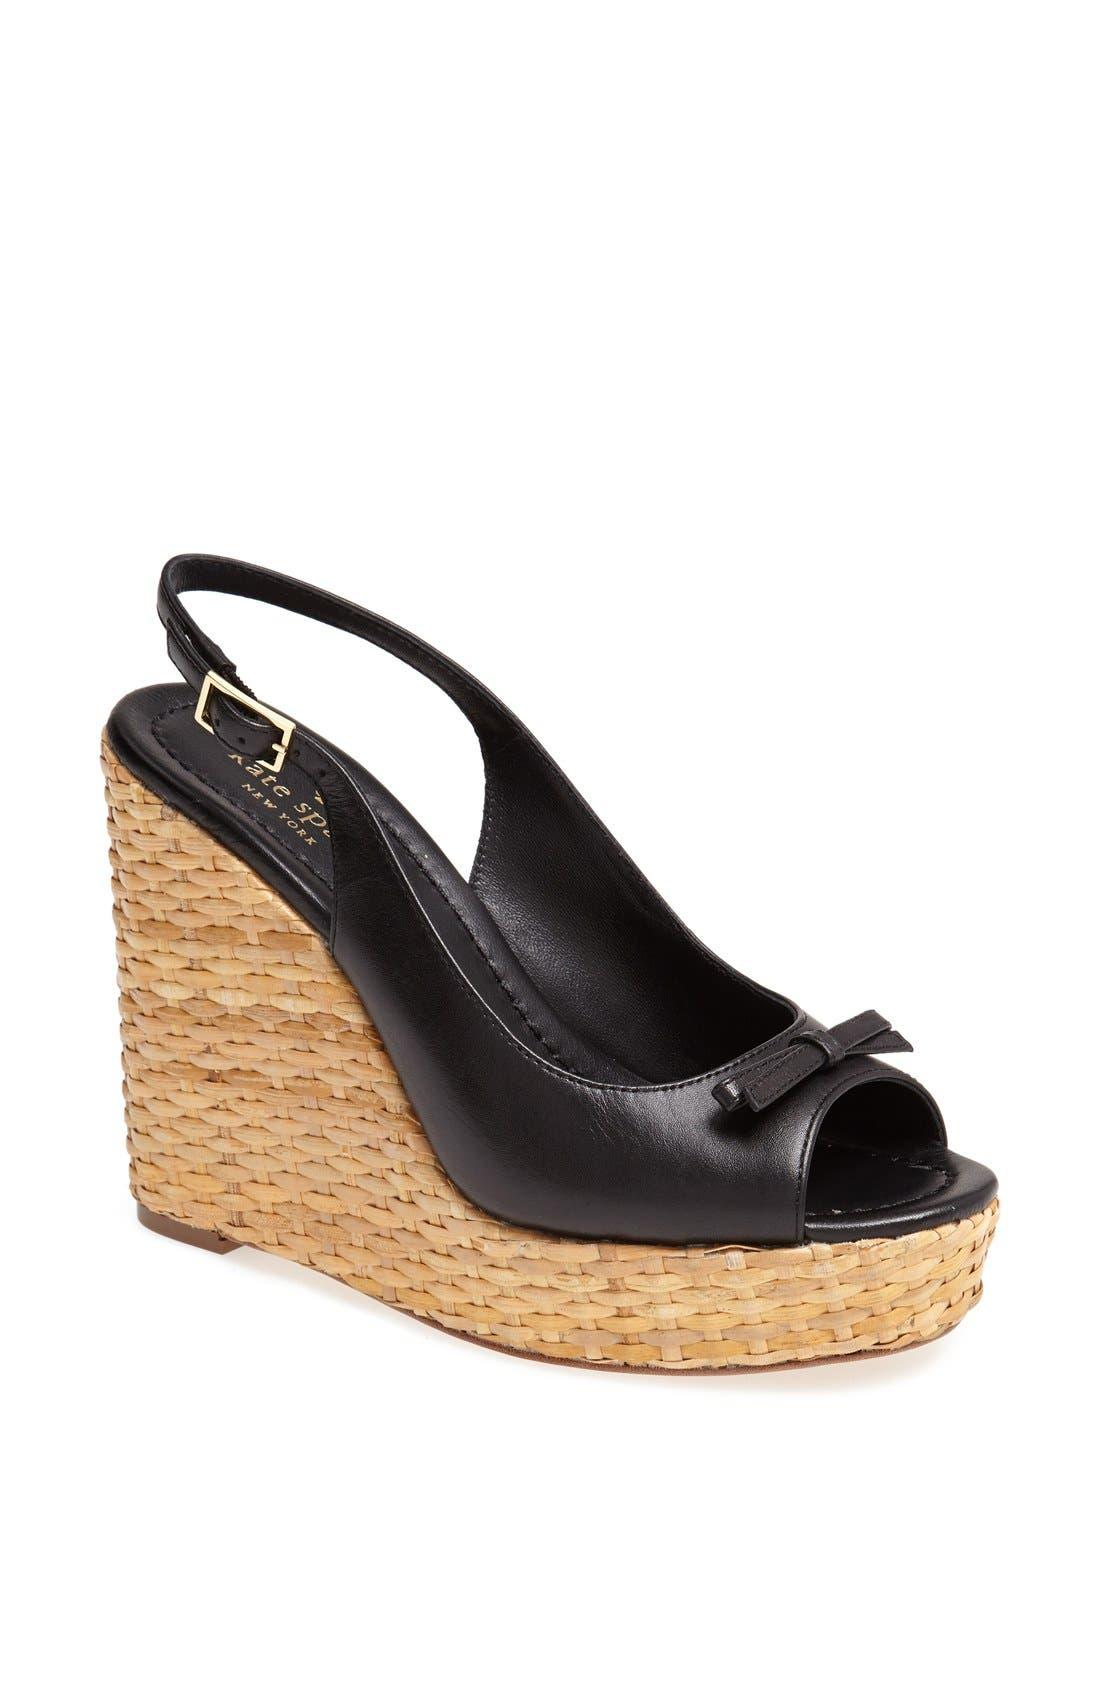 Main Image - kate spade new york 'della' wedge sandal